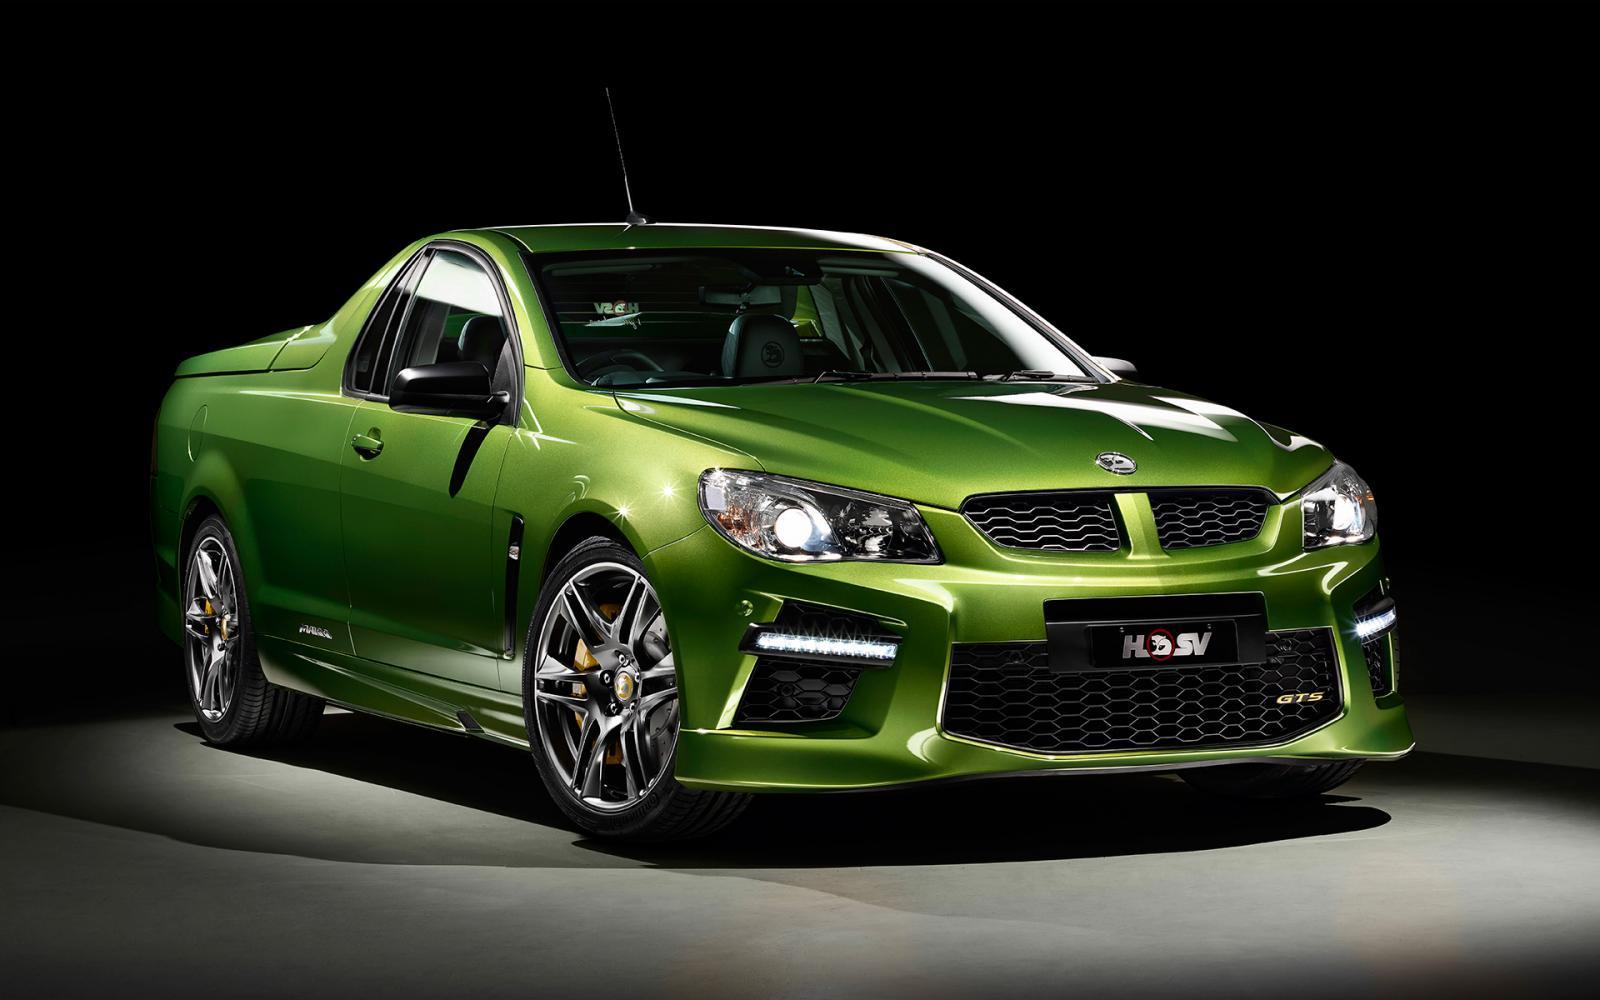 HSV GTS Maloo on sale in Australia, arrives November | PerformanceDrive